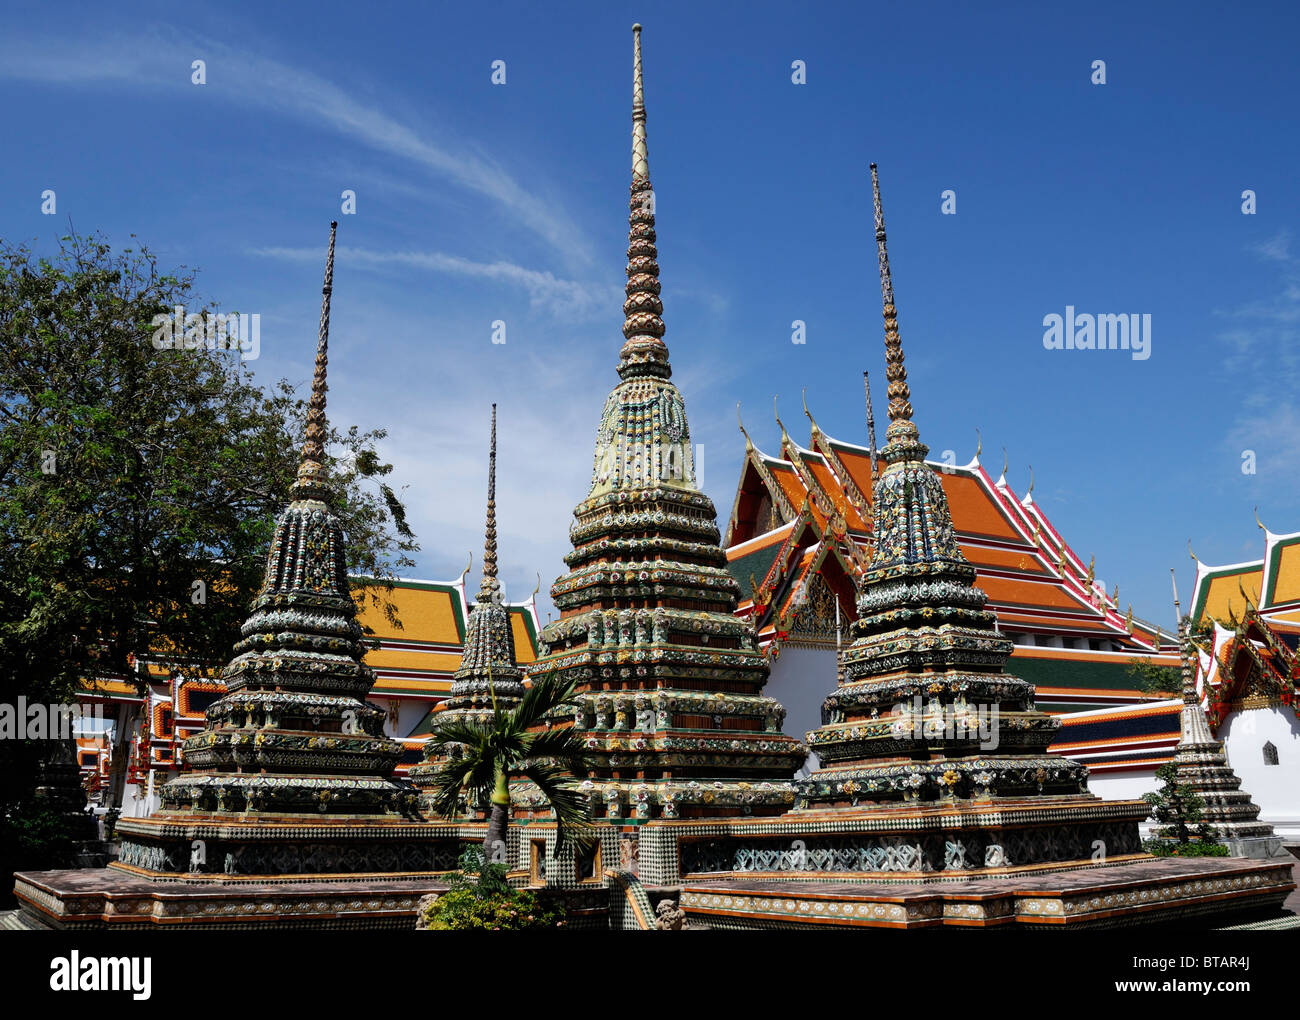 Stock Photo - Wat Pho Temple of the reclining buddha Wat Phra Chetuphon bangkok thailand Phra chedi rai stupa & Wat Pho Temple of the reclining buddha Wat Phra Chetuphon bangkok ... islam-shia.org